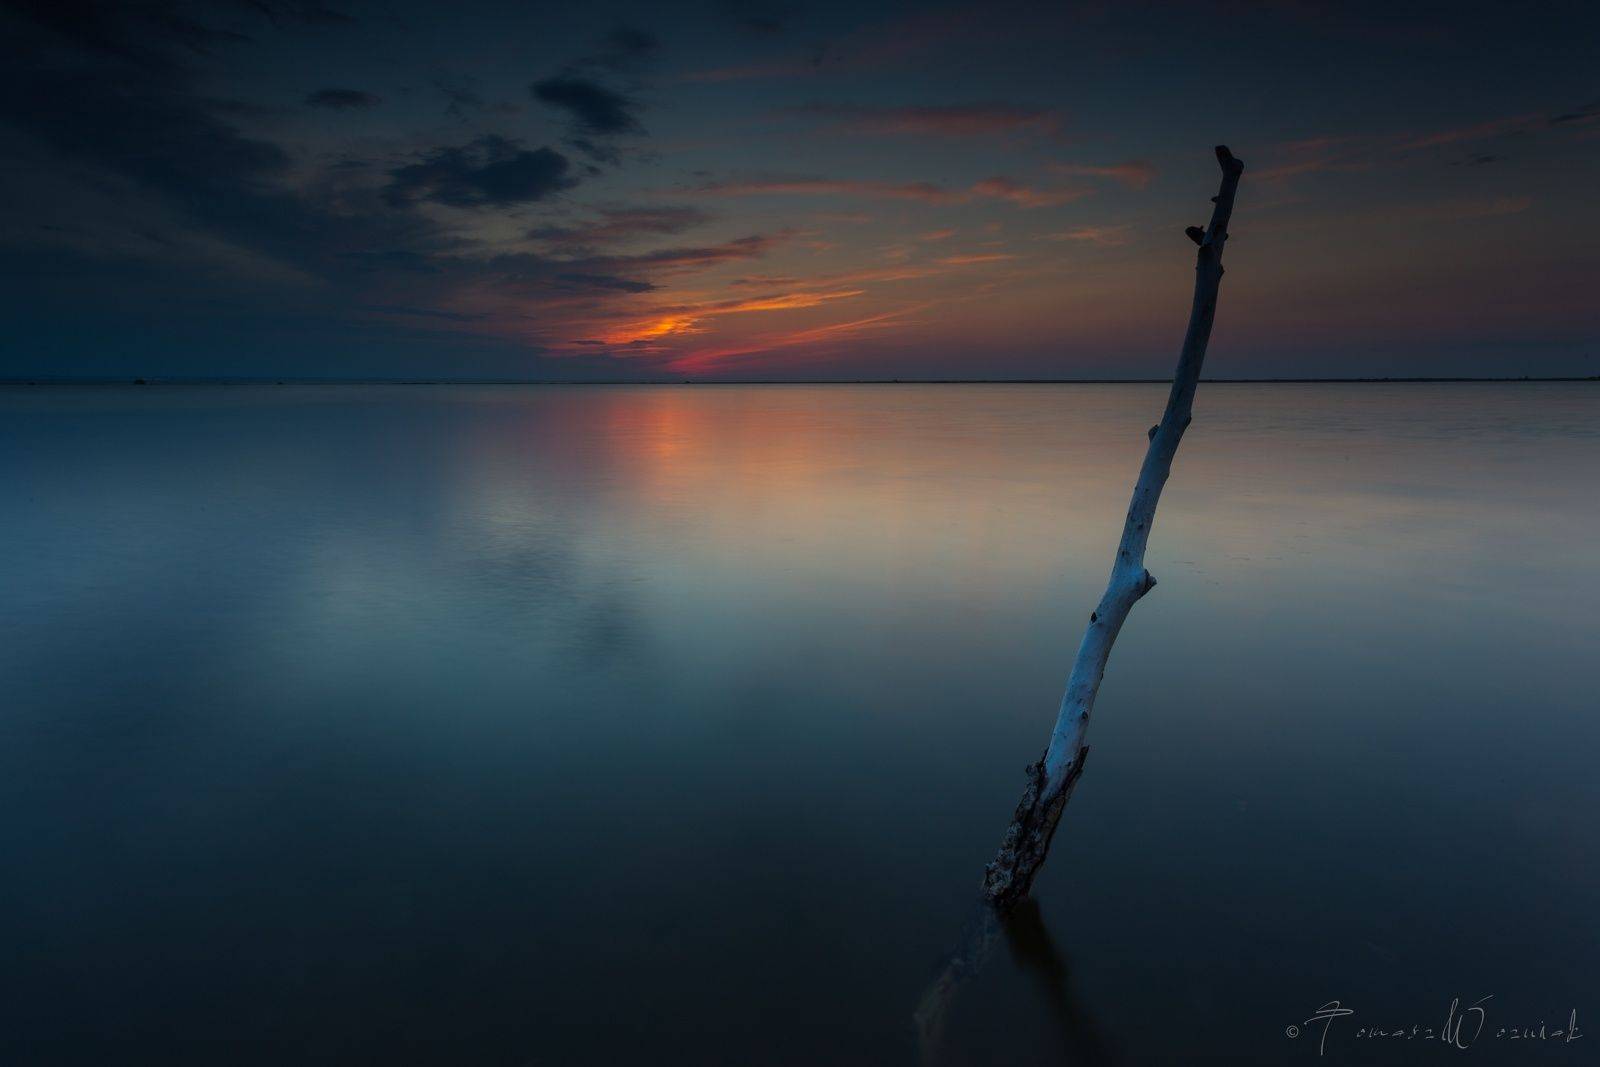 Colors of sunset by Tomasz Wozniak on 500px